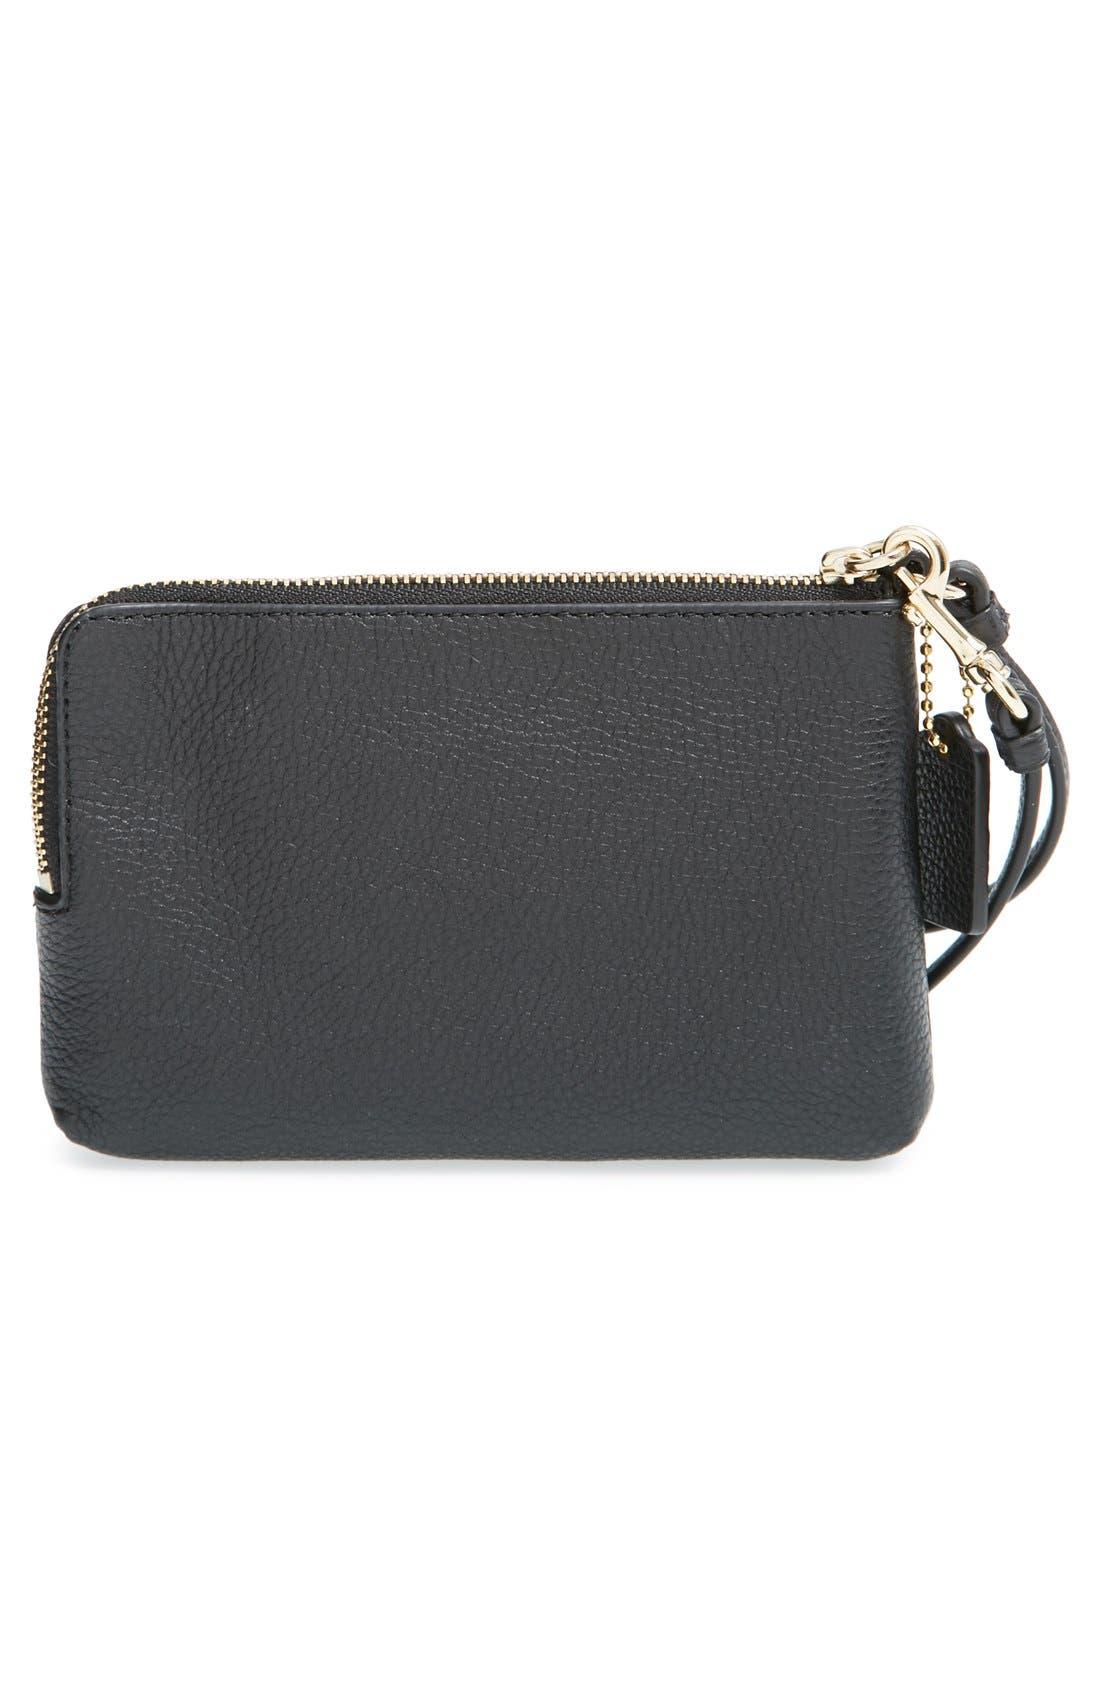 COACH, 'Madison' Double Zip Leather Wallet, Alternate thumbnail 3, color, 001